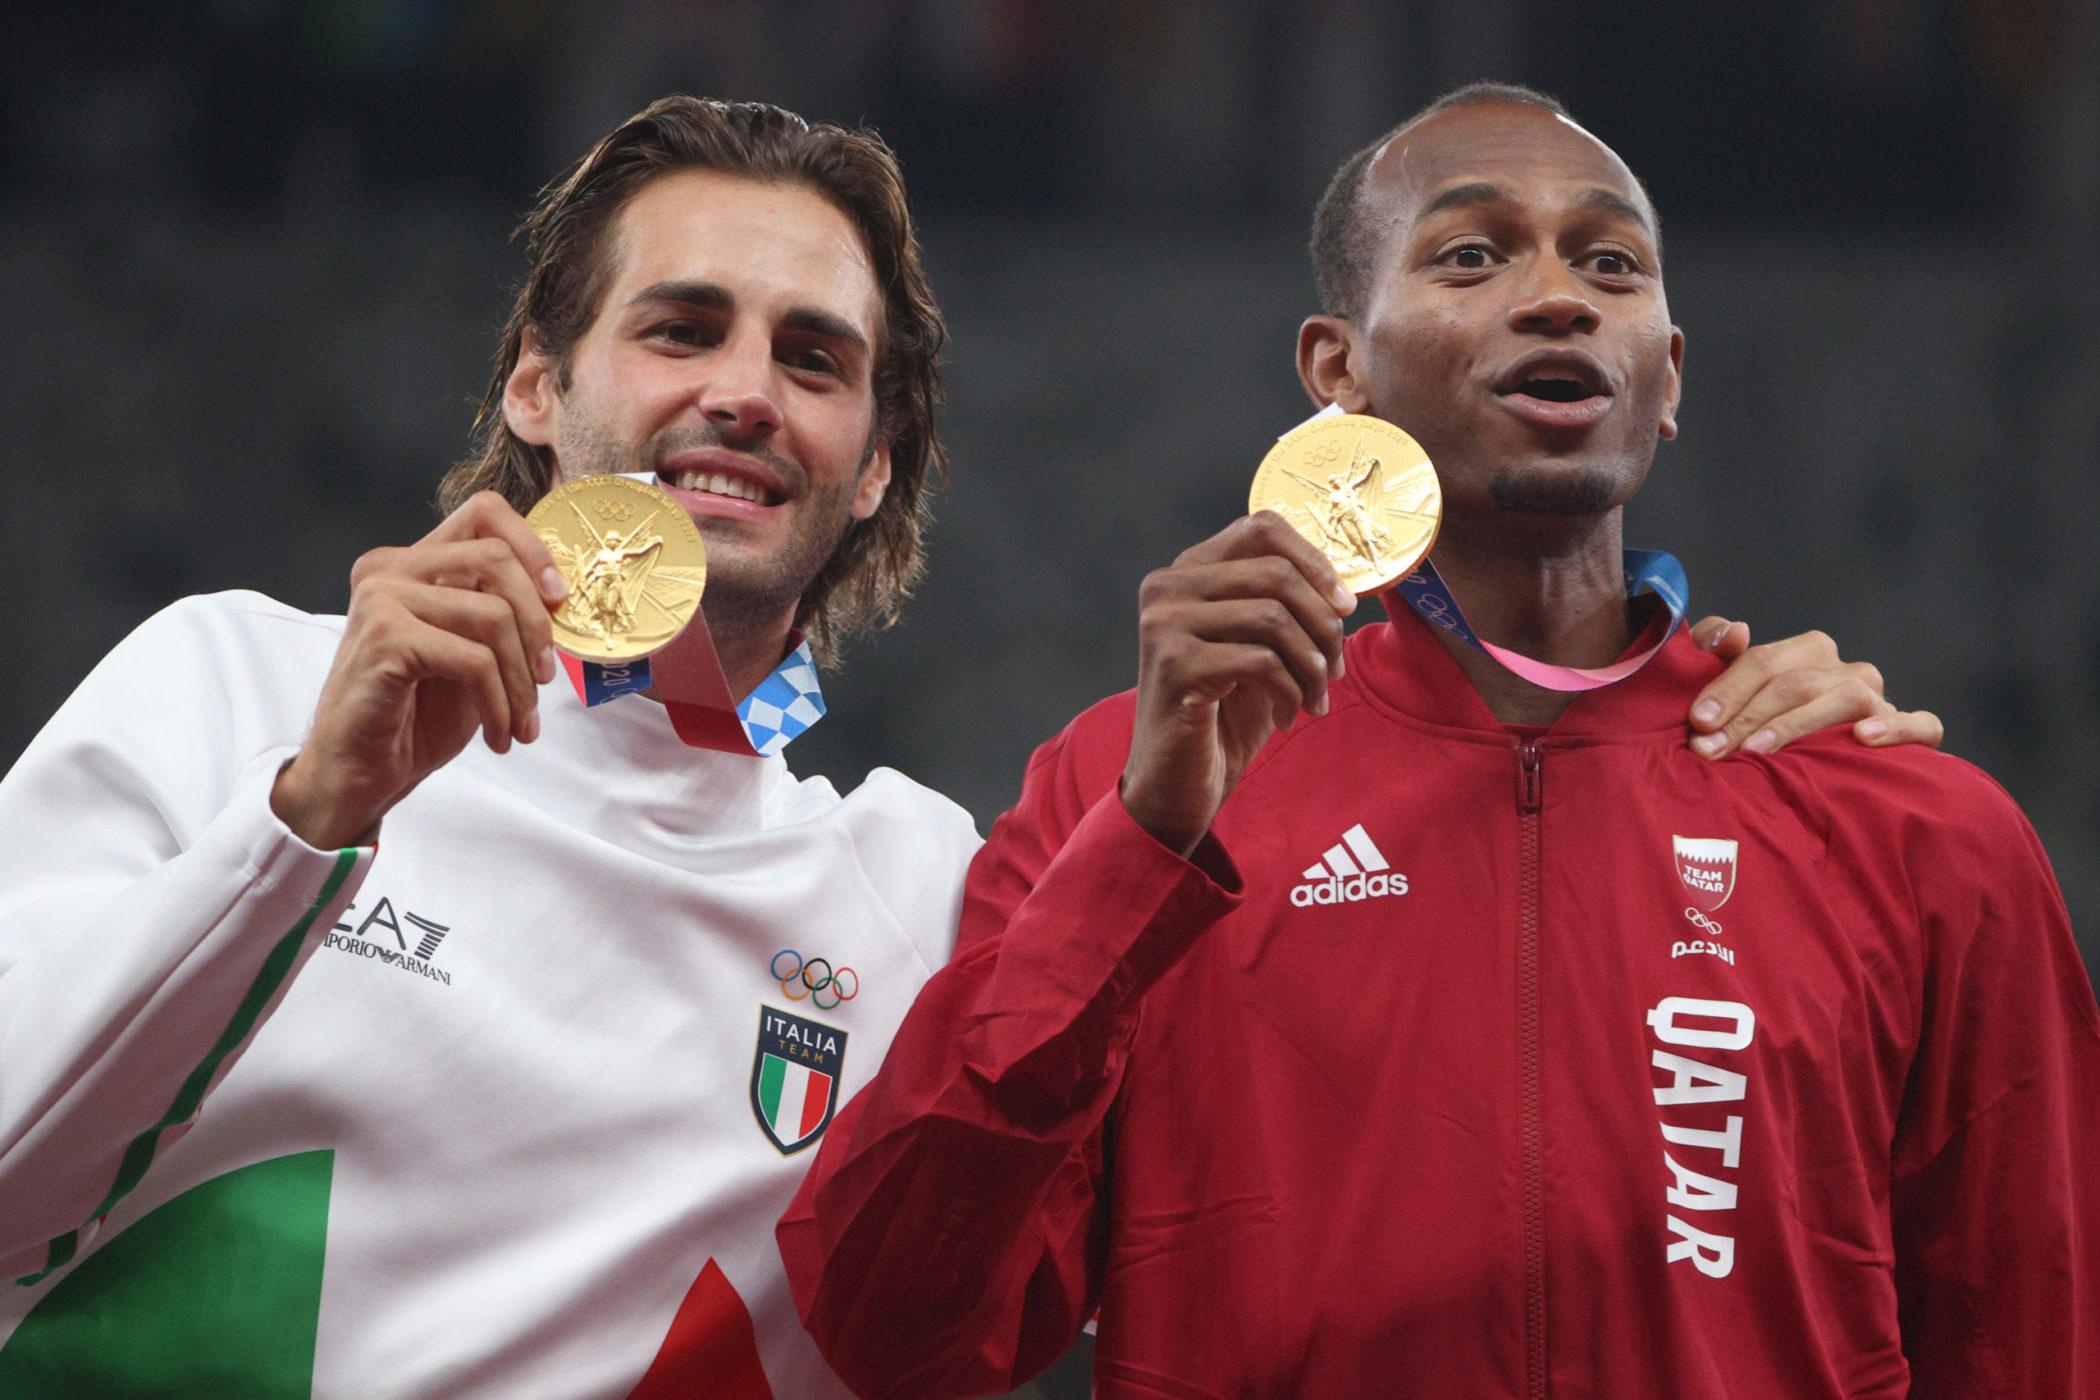 High Jump Gold Medal Winners